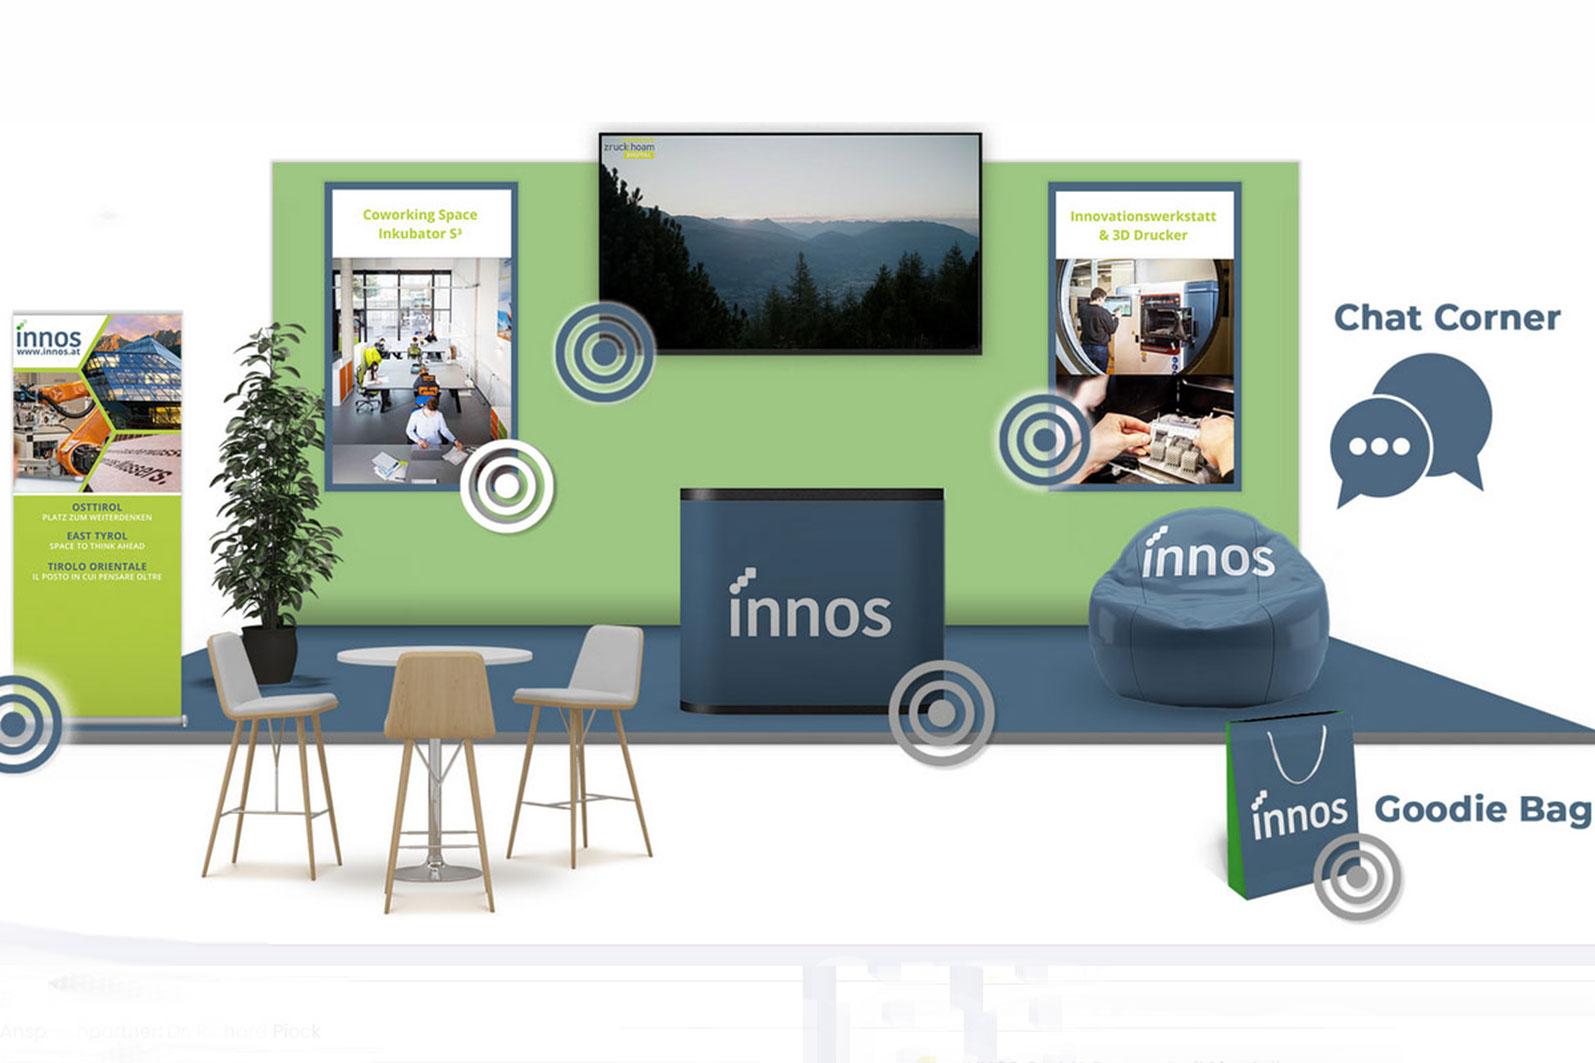 ZRUCK HOAM Digitale Jobmesse Messestand INNOS GmbH